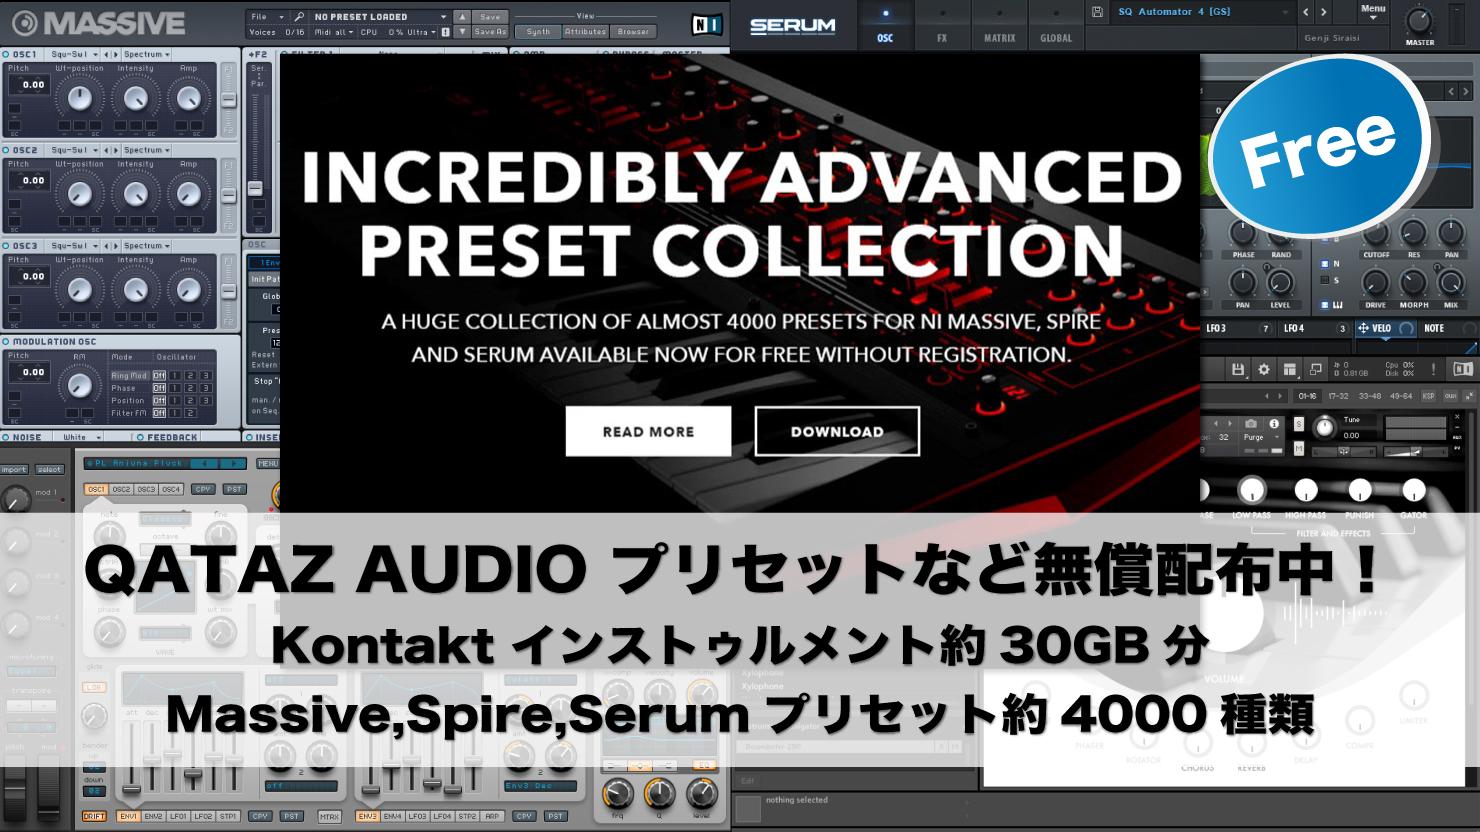 QATAZ AUDIO 約30GB分のKONTAKT用音源とMASSIVE,SERUM,Spireのプリセット約4000種類を無償配布中!